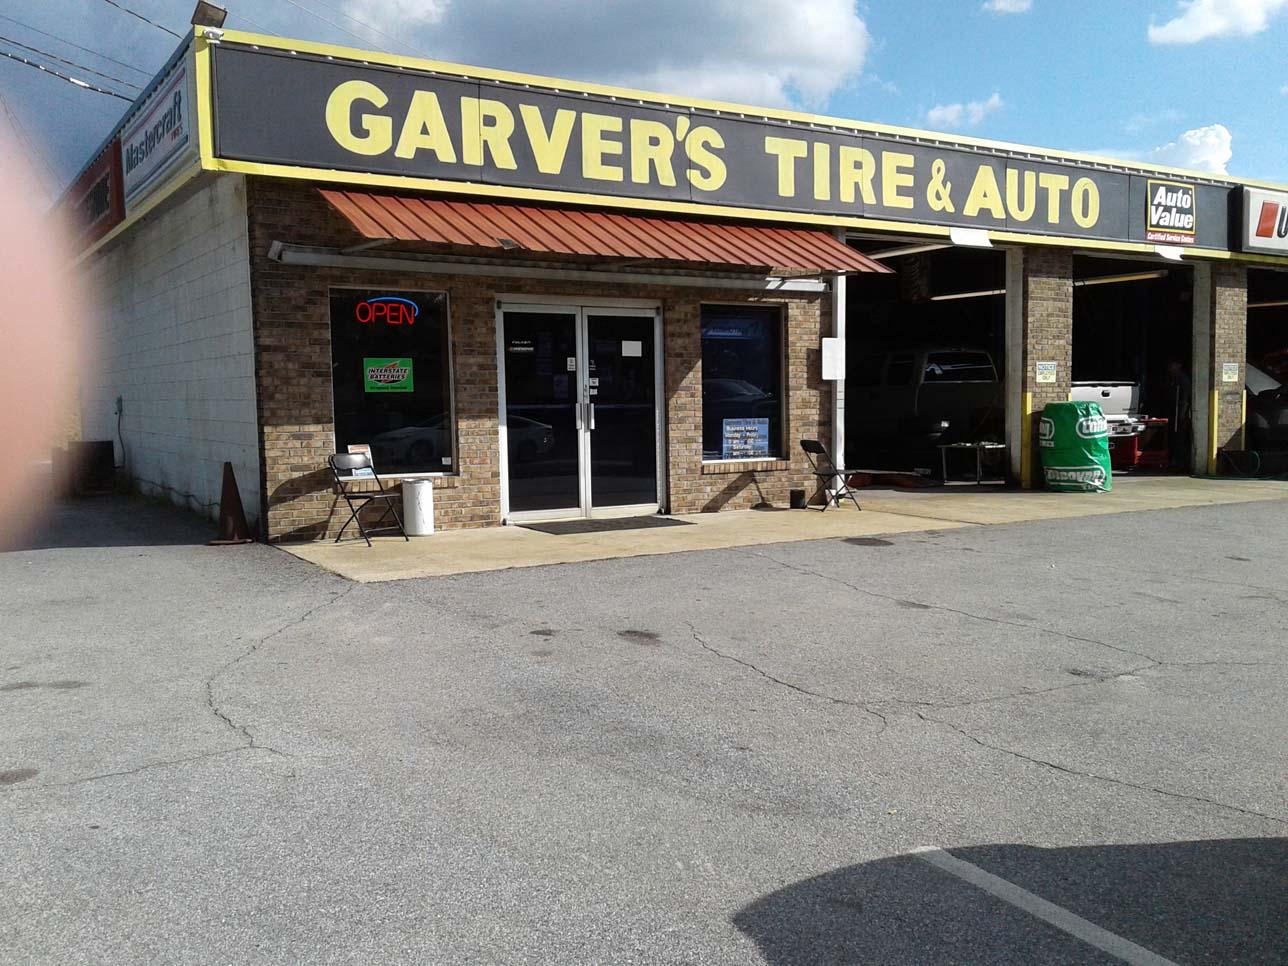 GARVER'S TIRE & AUTO